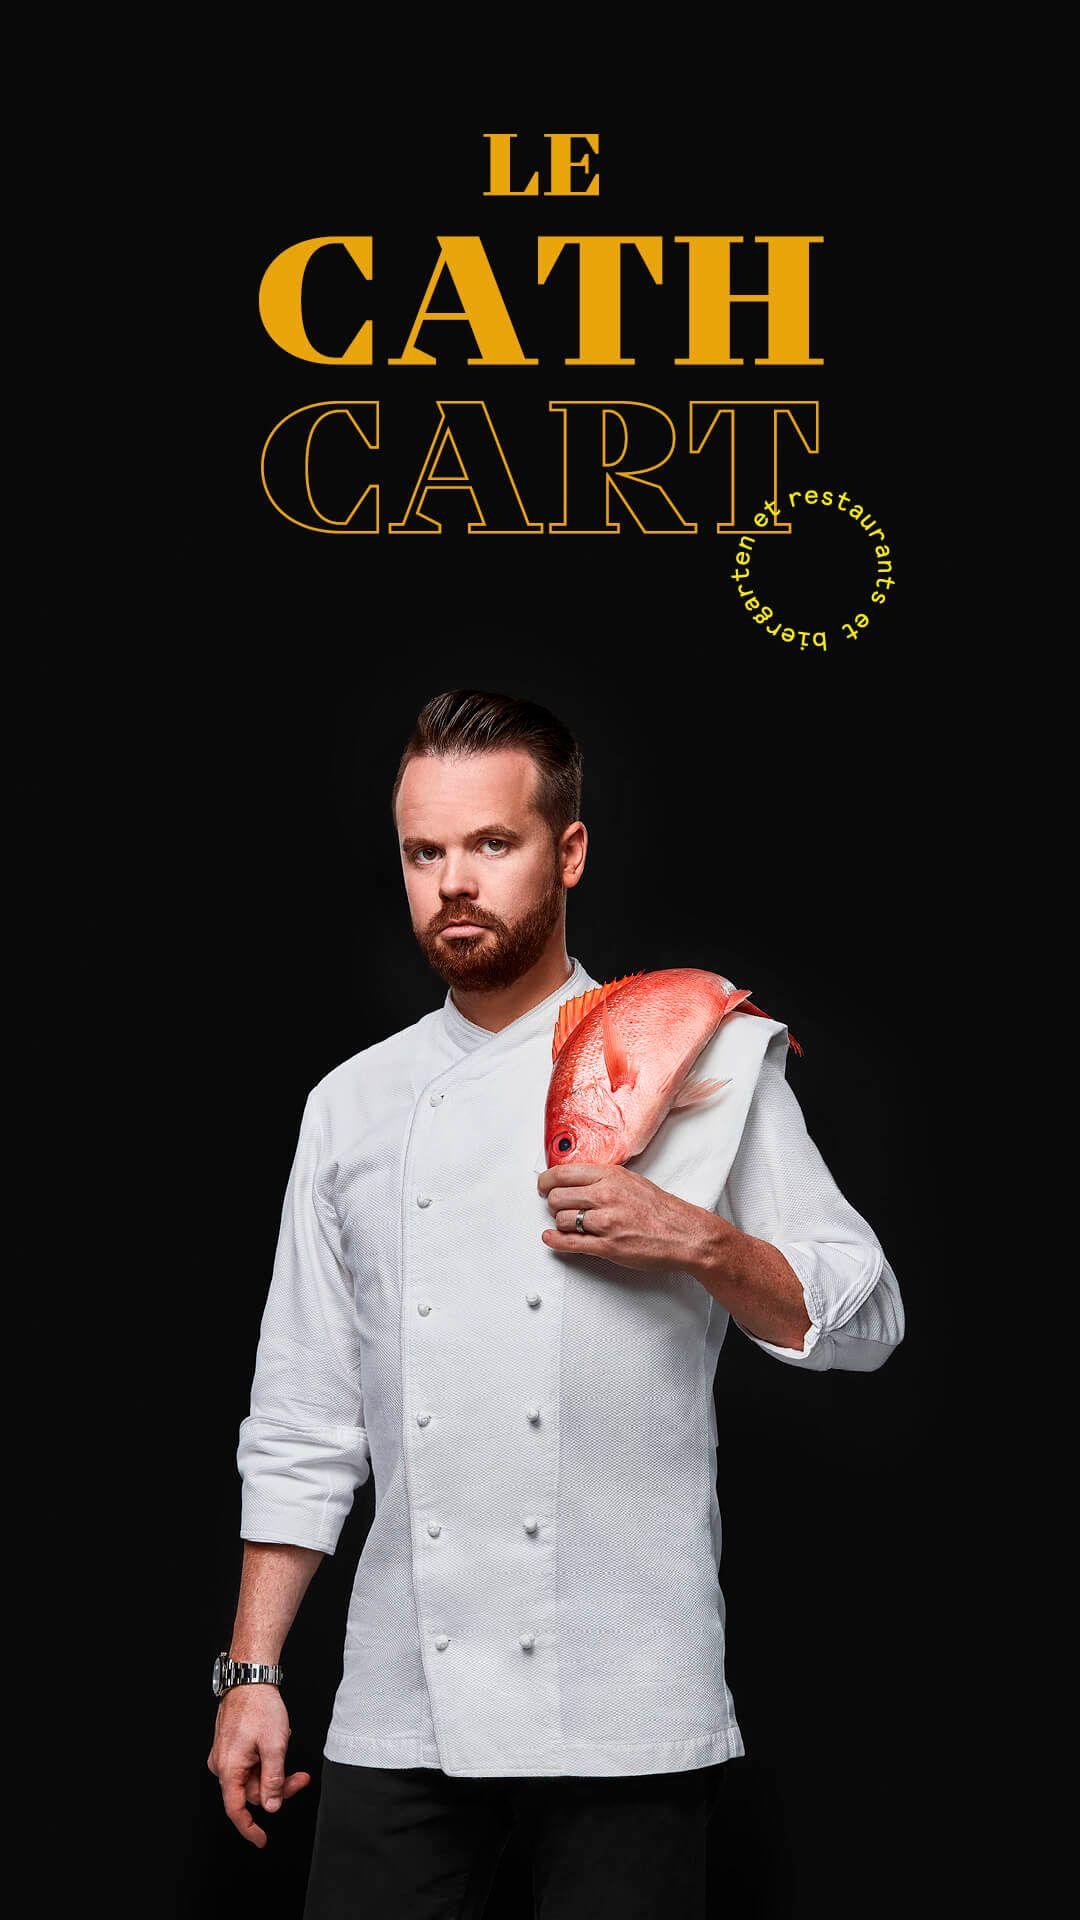 Olivier Vigneault by Jocelyn Michel for Cathcart restaurant